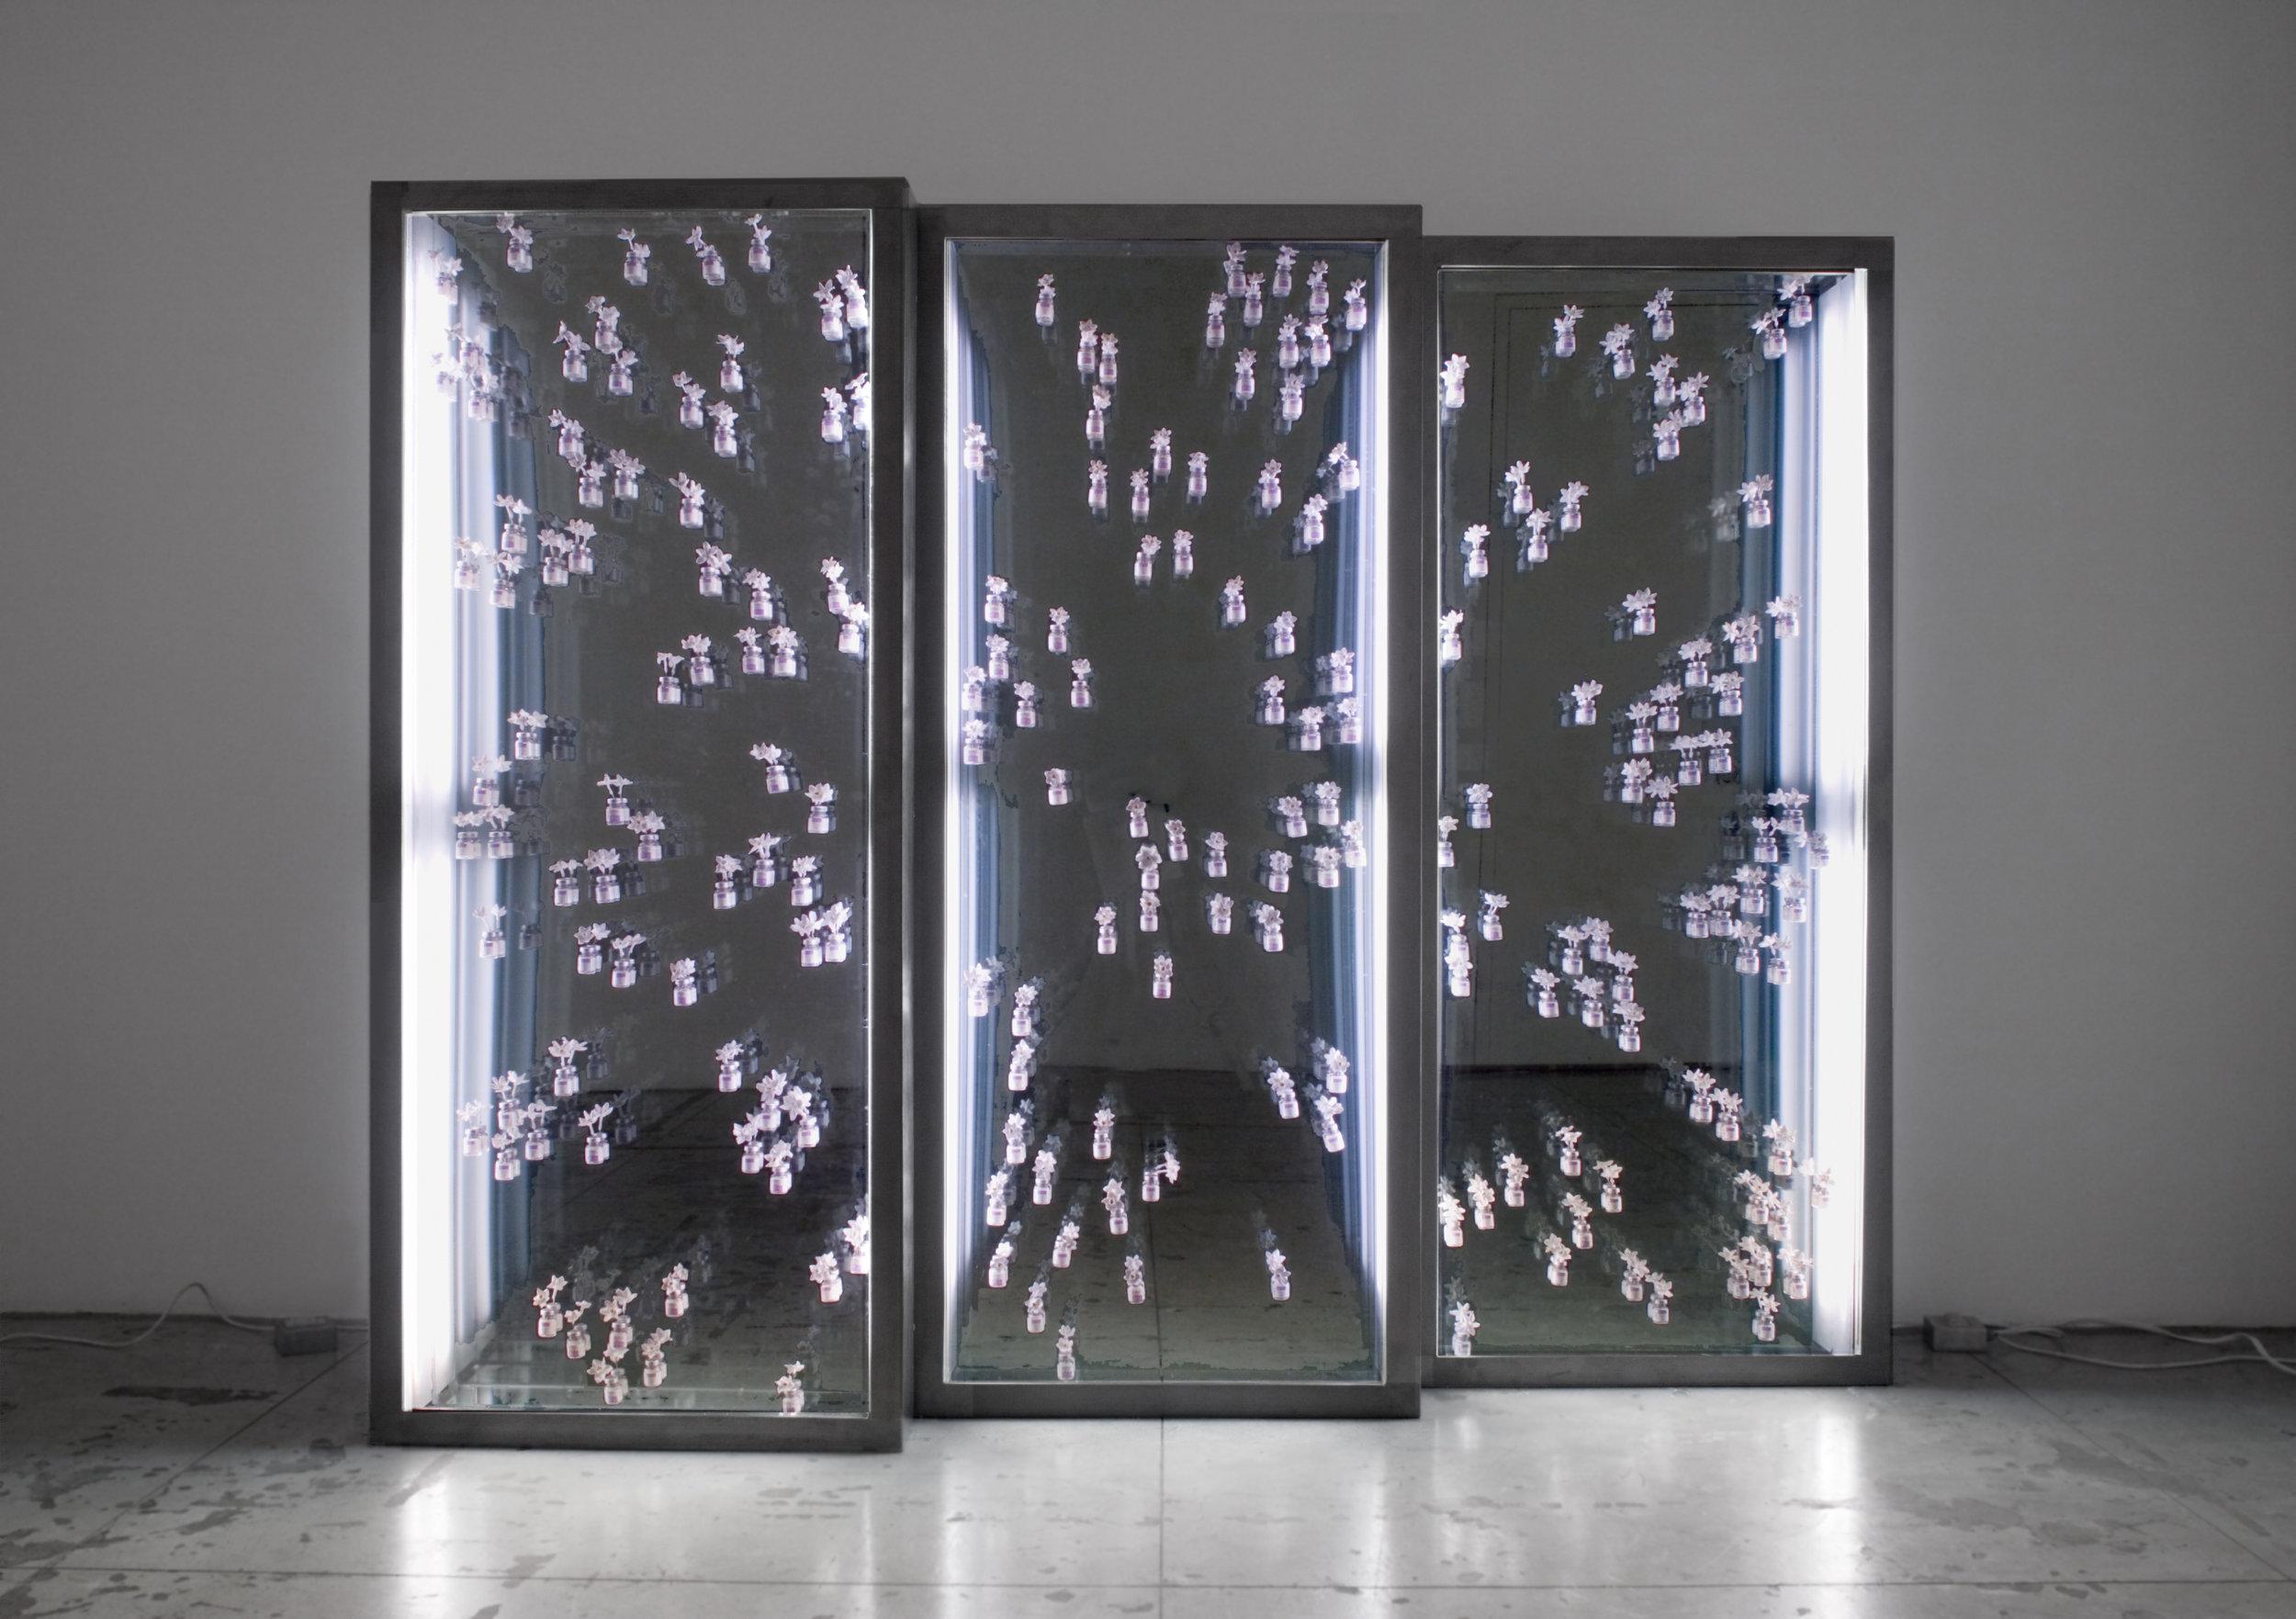 The Gaze I, II,  and  III , 2007  Steel, glass, encaustic, narcissus flowers, Botox vials, fluorescents, plexiglass  73 x 30 x 6 inches